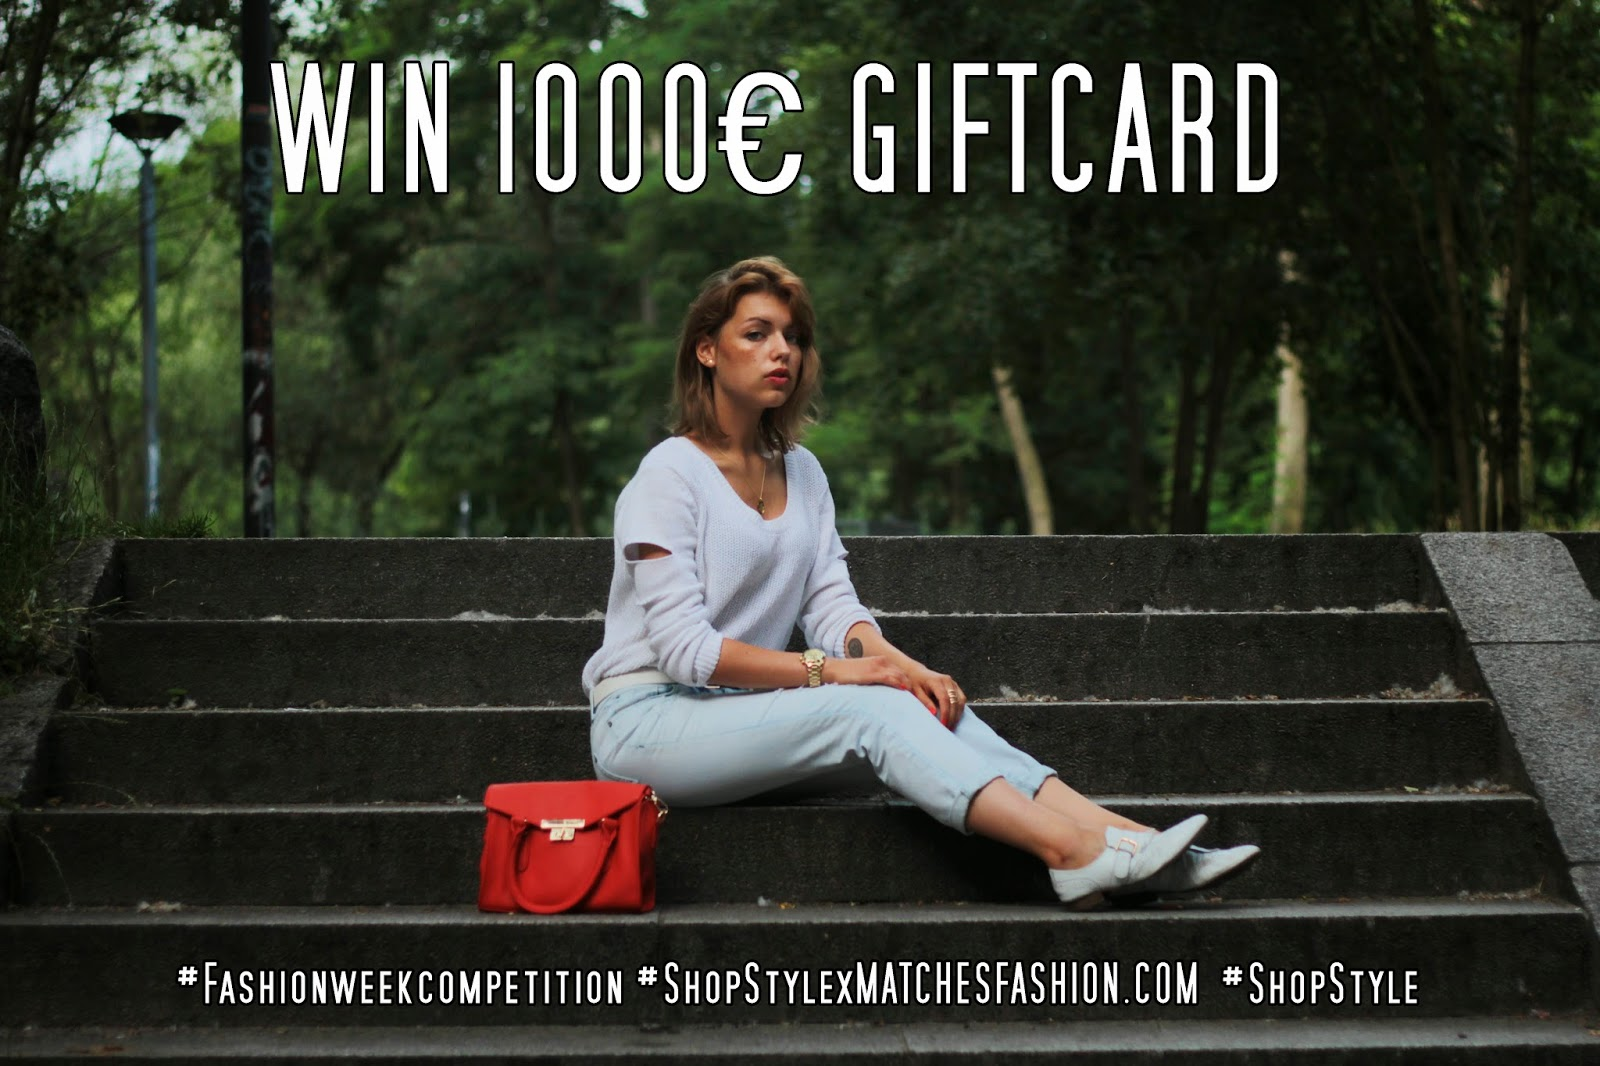 my berlin fashion giveaway #Fashionweekcompetition, #ShopStylexMATCHESFASHION.COM, #ShopStyle